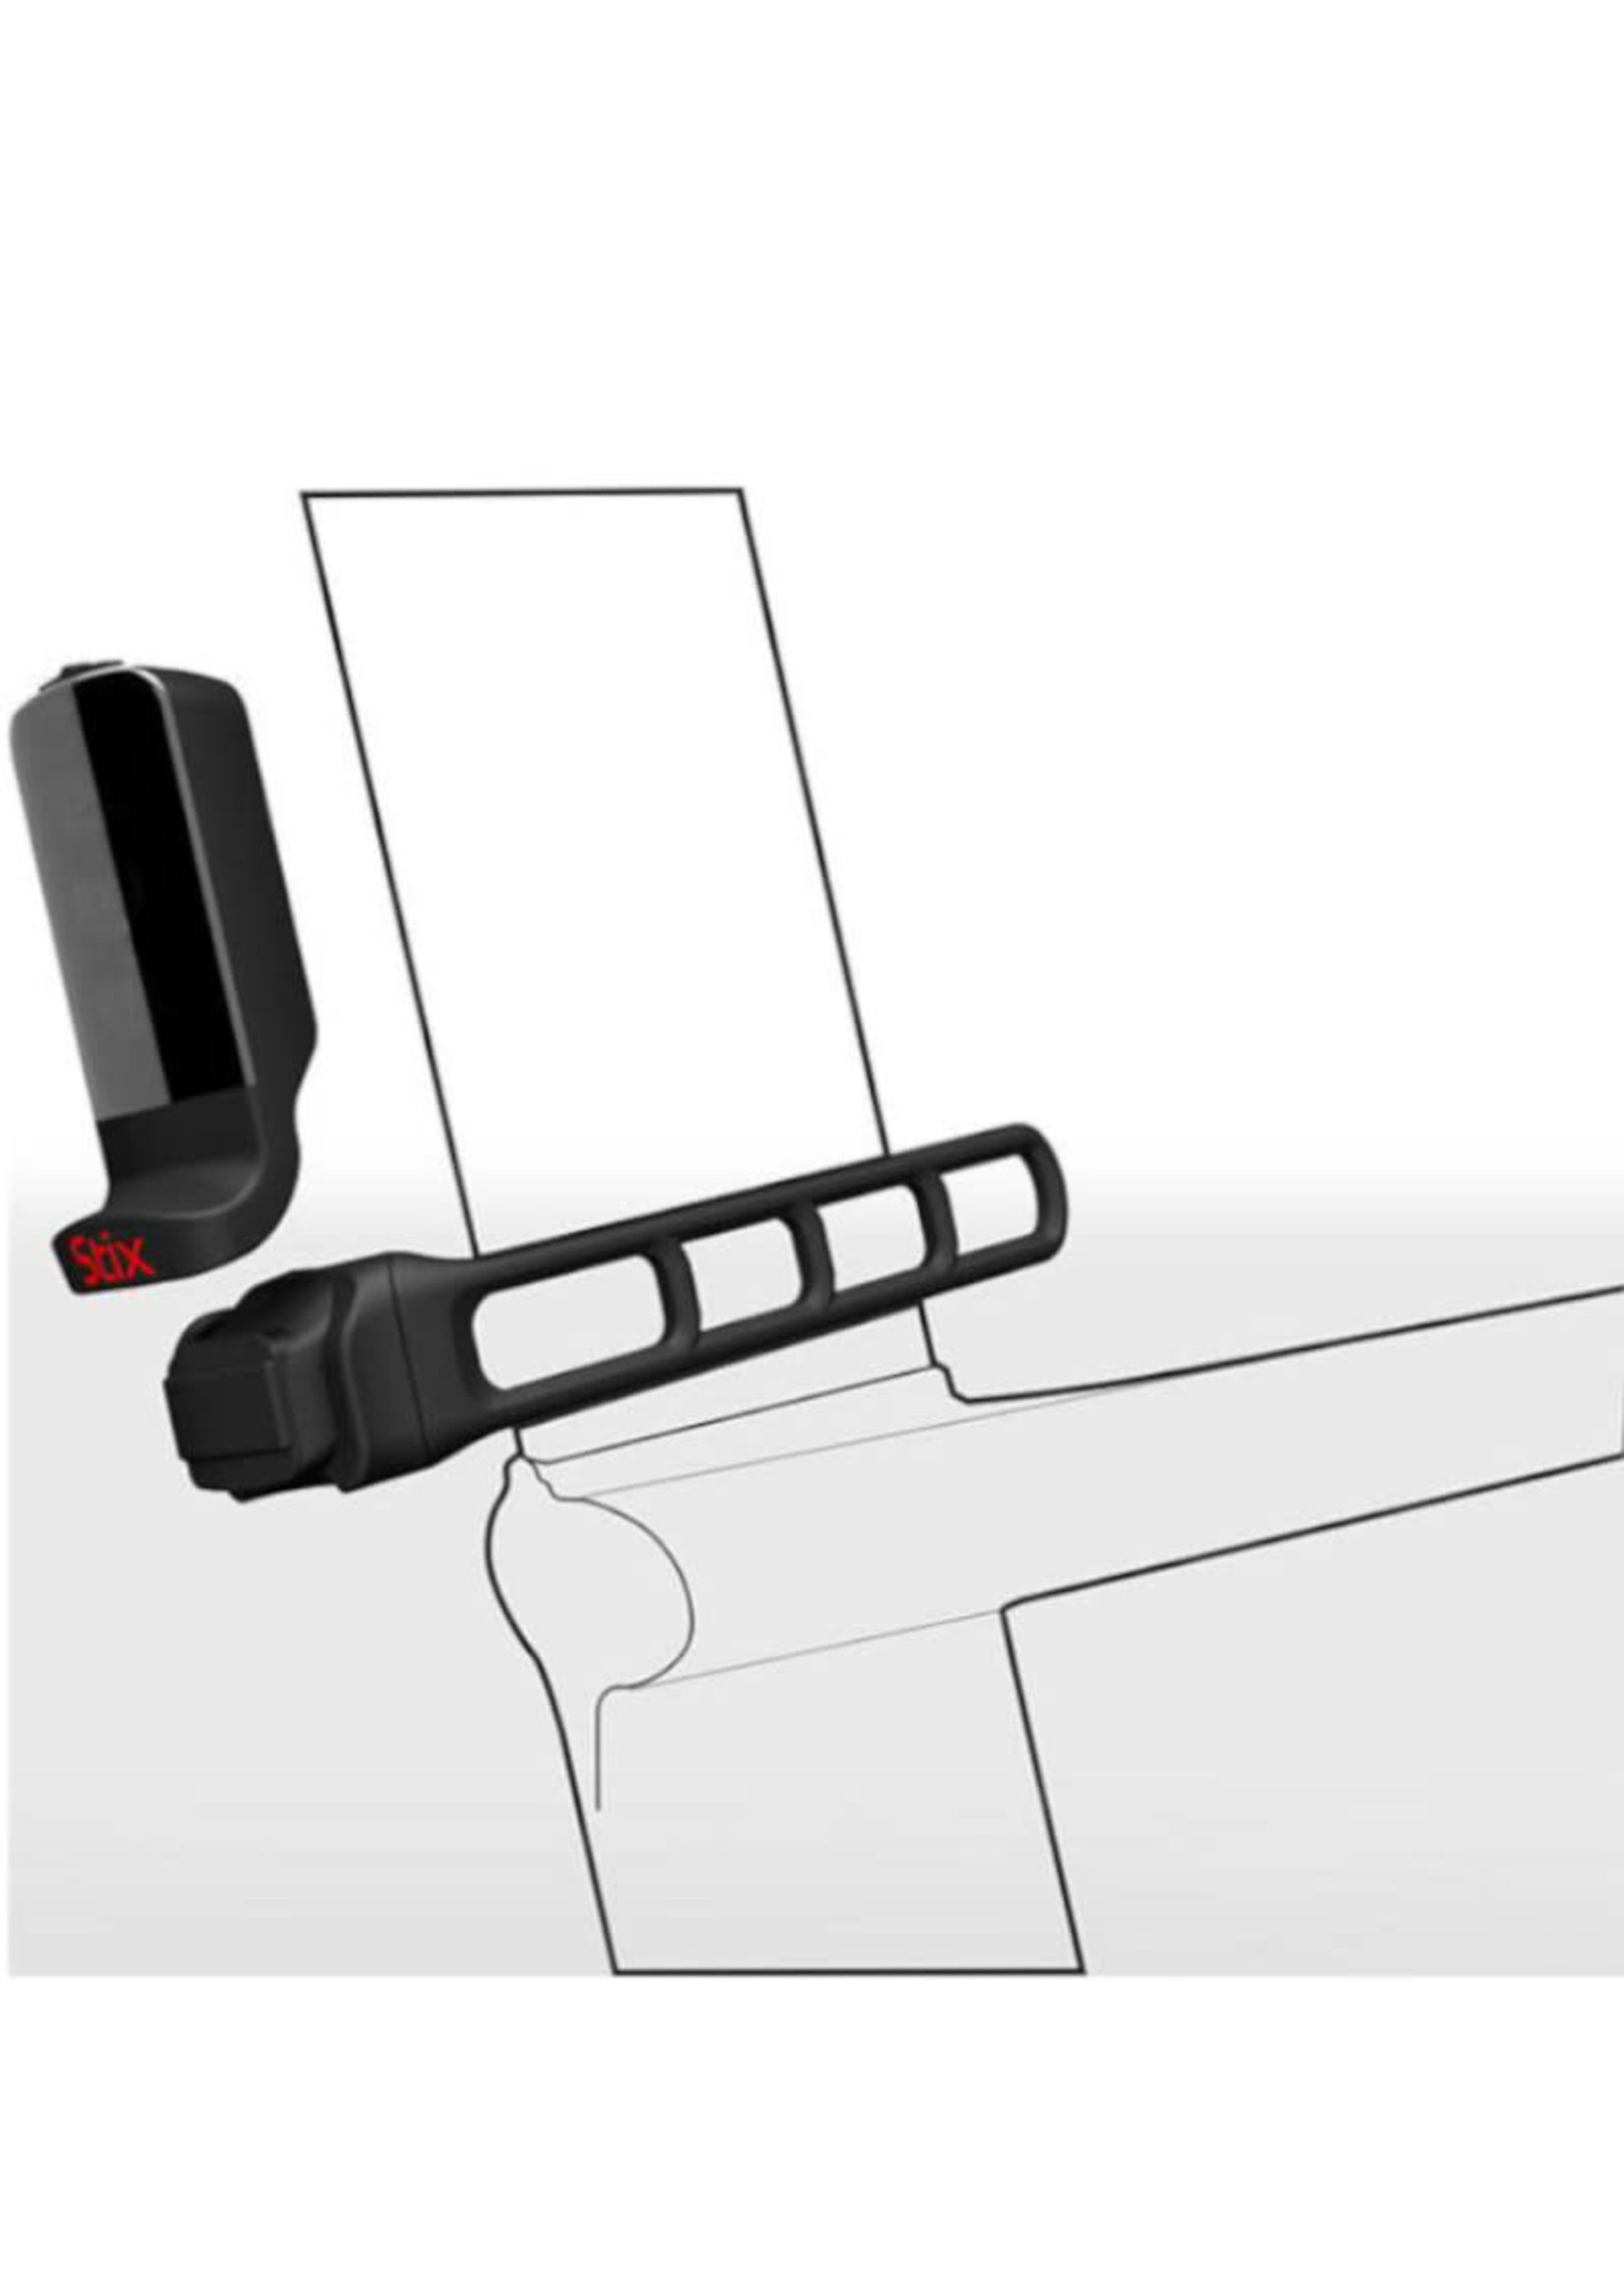 Specialized - STIX AERO STRAP MOUNT Black